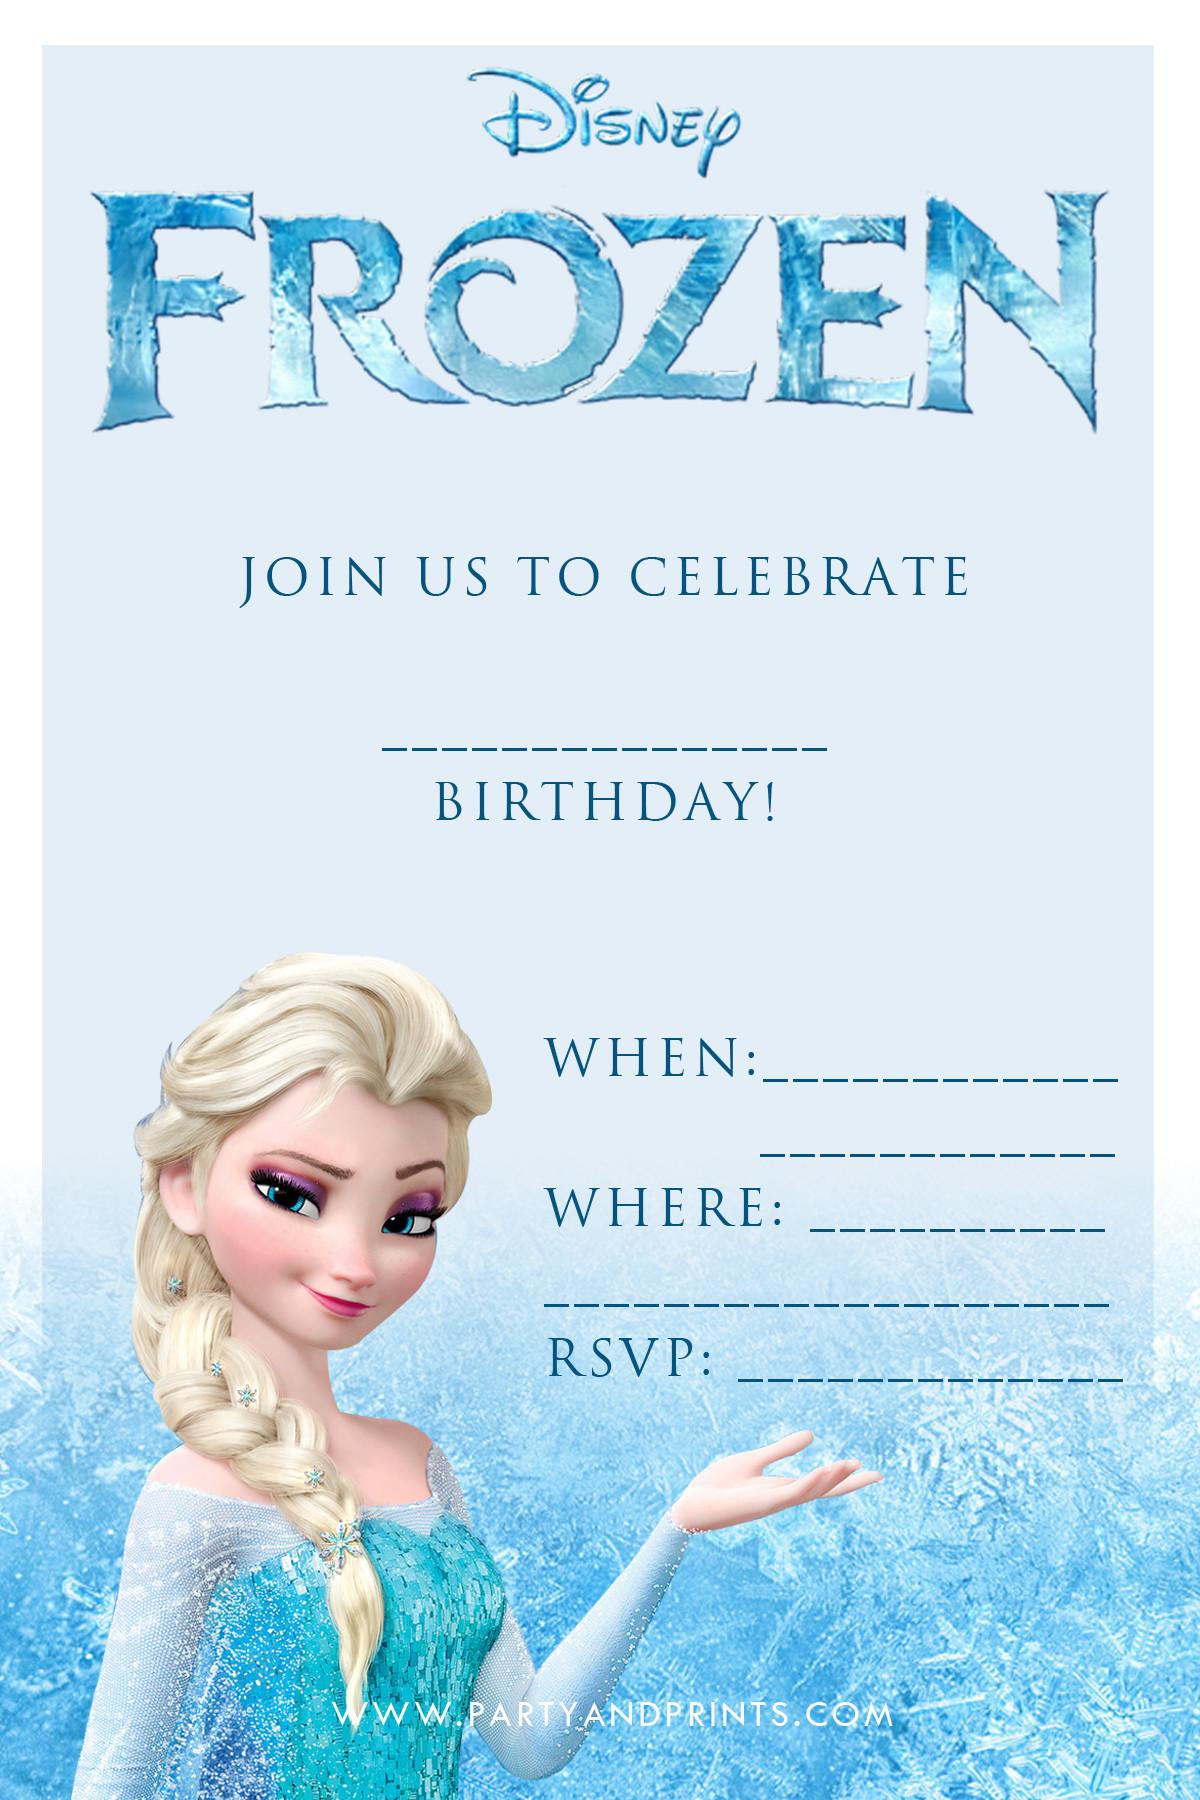 Best ideas about Frozen Birthday Party Invitations . Save or Pin 20 Frozen Birthday Party Ideas Now.